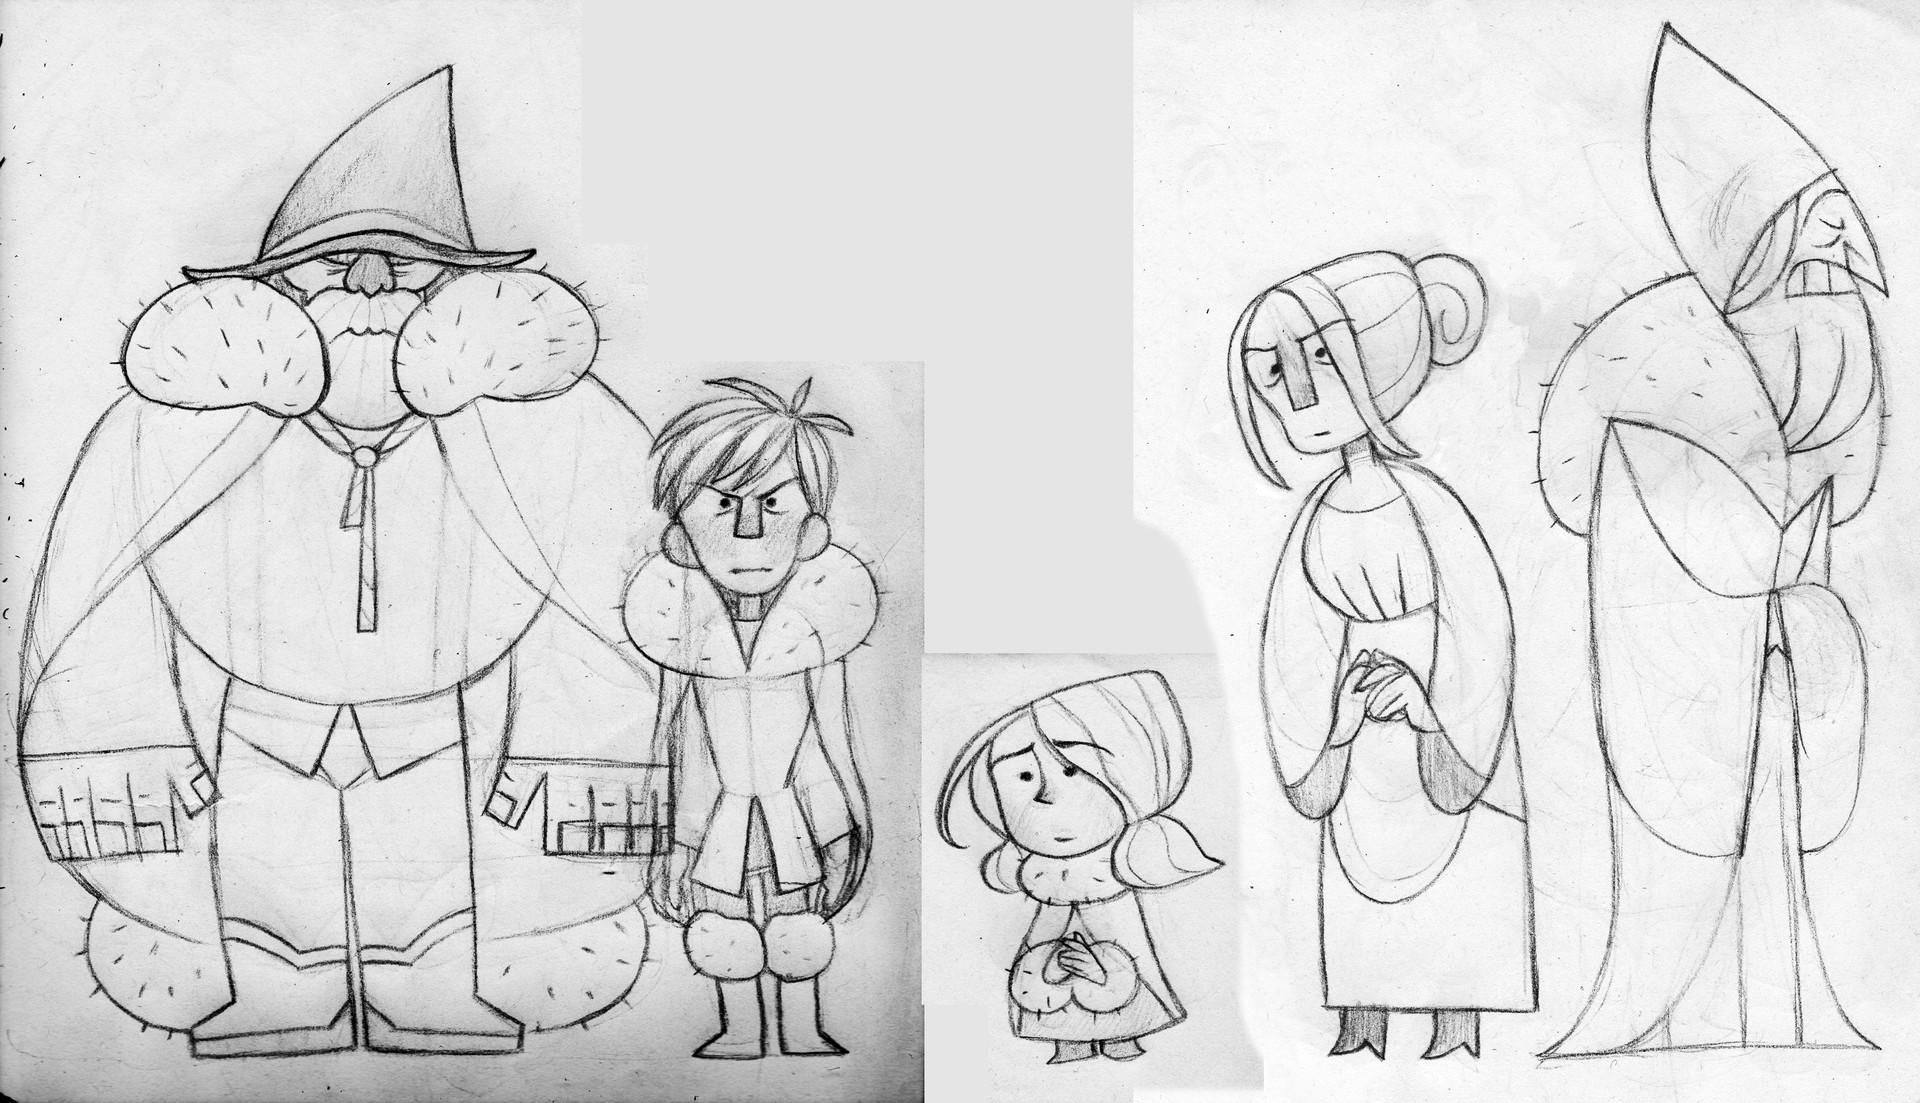 Lineup - Sketch Chief, Boy, Little Red, Mother, Elder